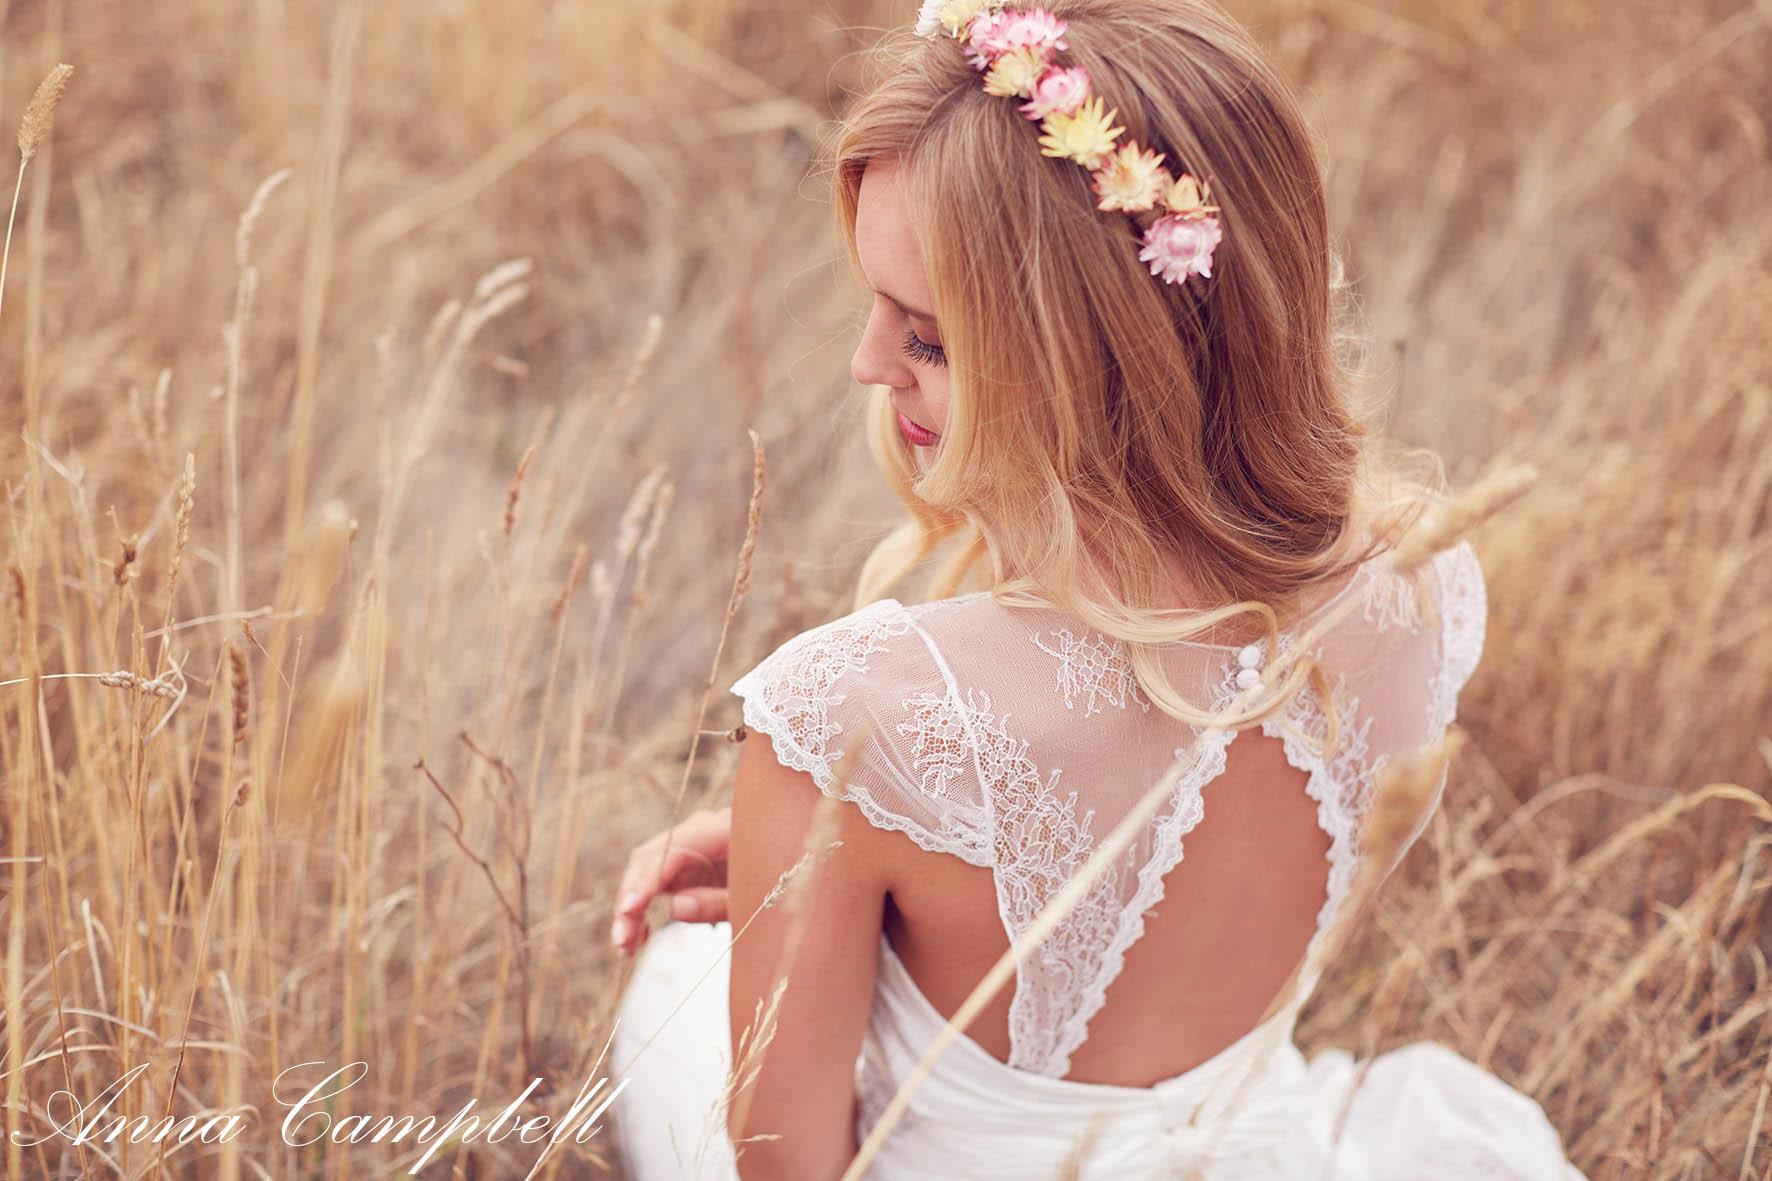 anna-campbell-forever-entwined-ivory-and-beau-savannah-bridal-boutique-savannah-wedding-dresses-milla-dress-illusion-neckline.jpg